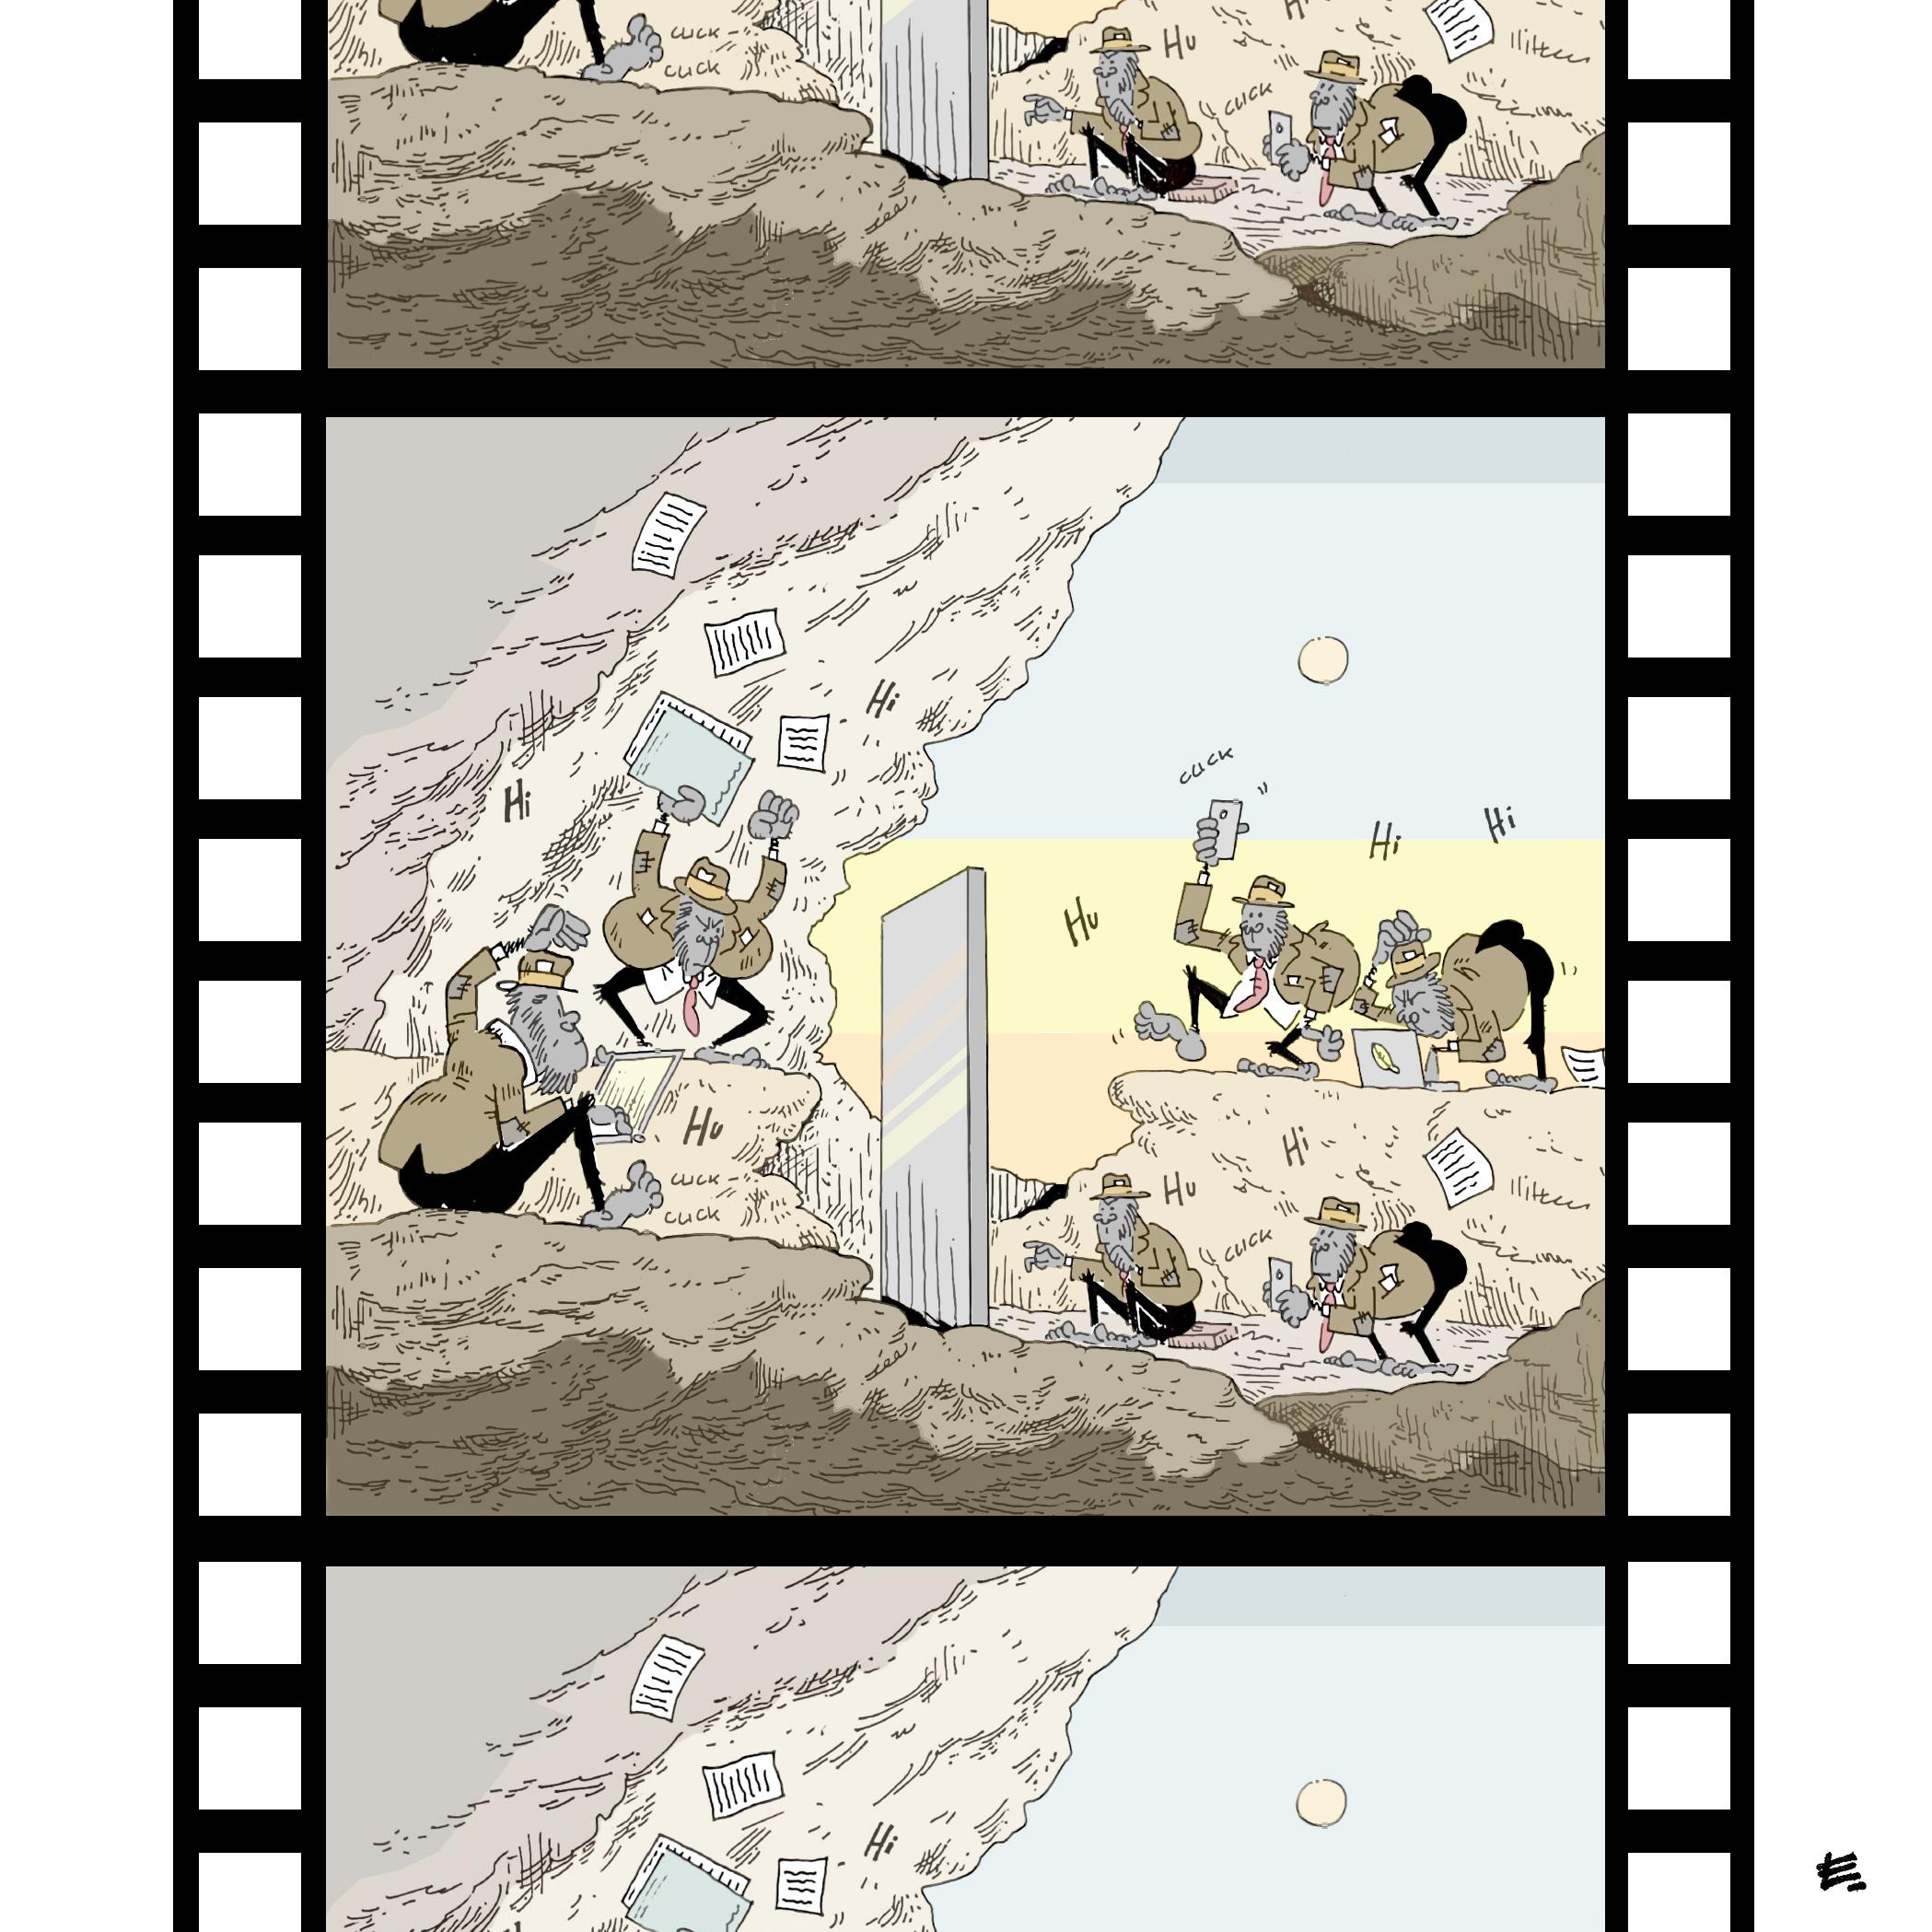 arte & humor